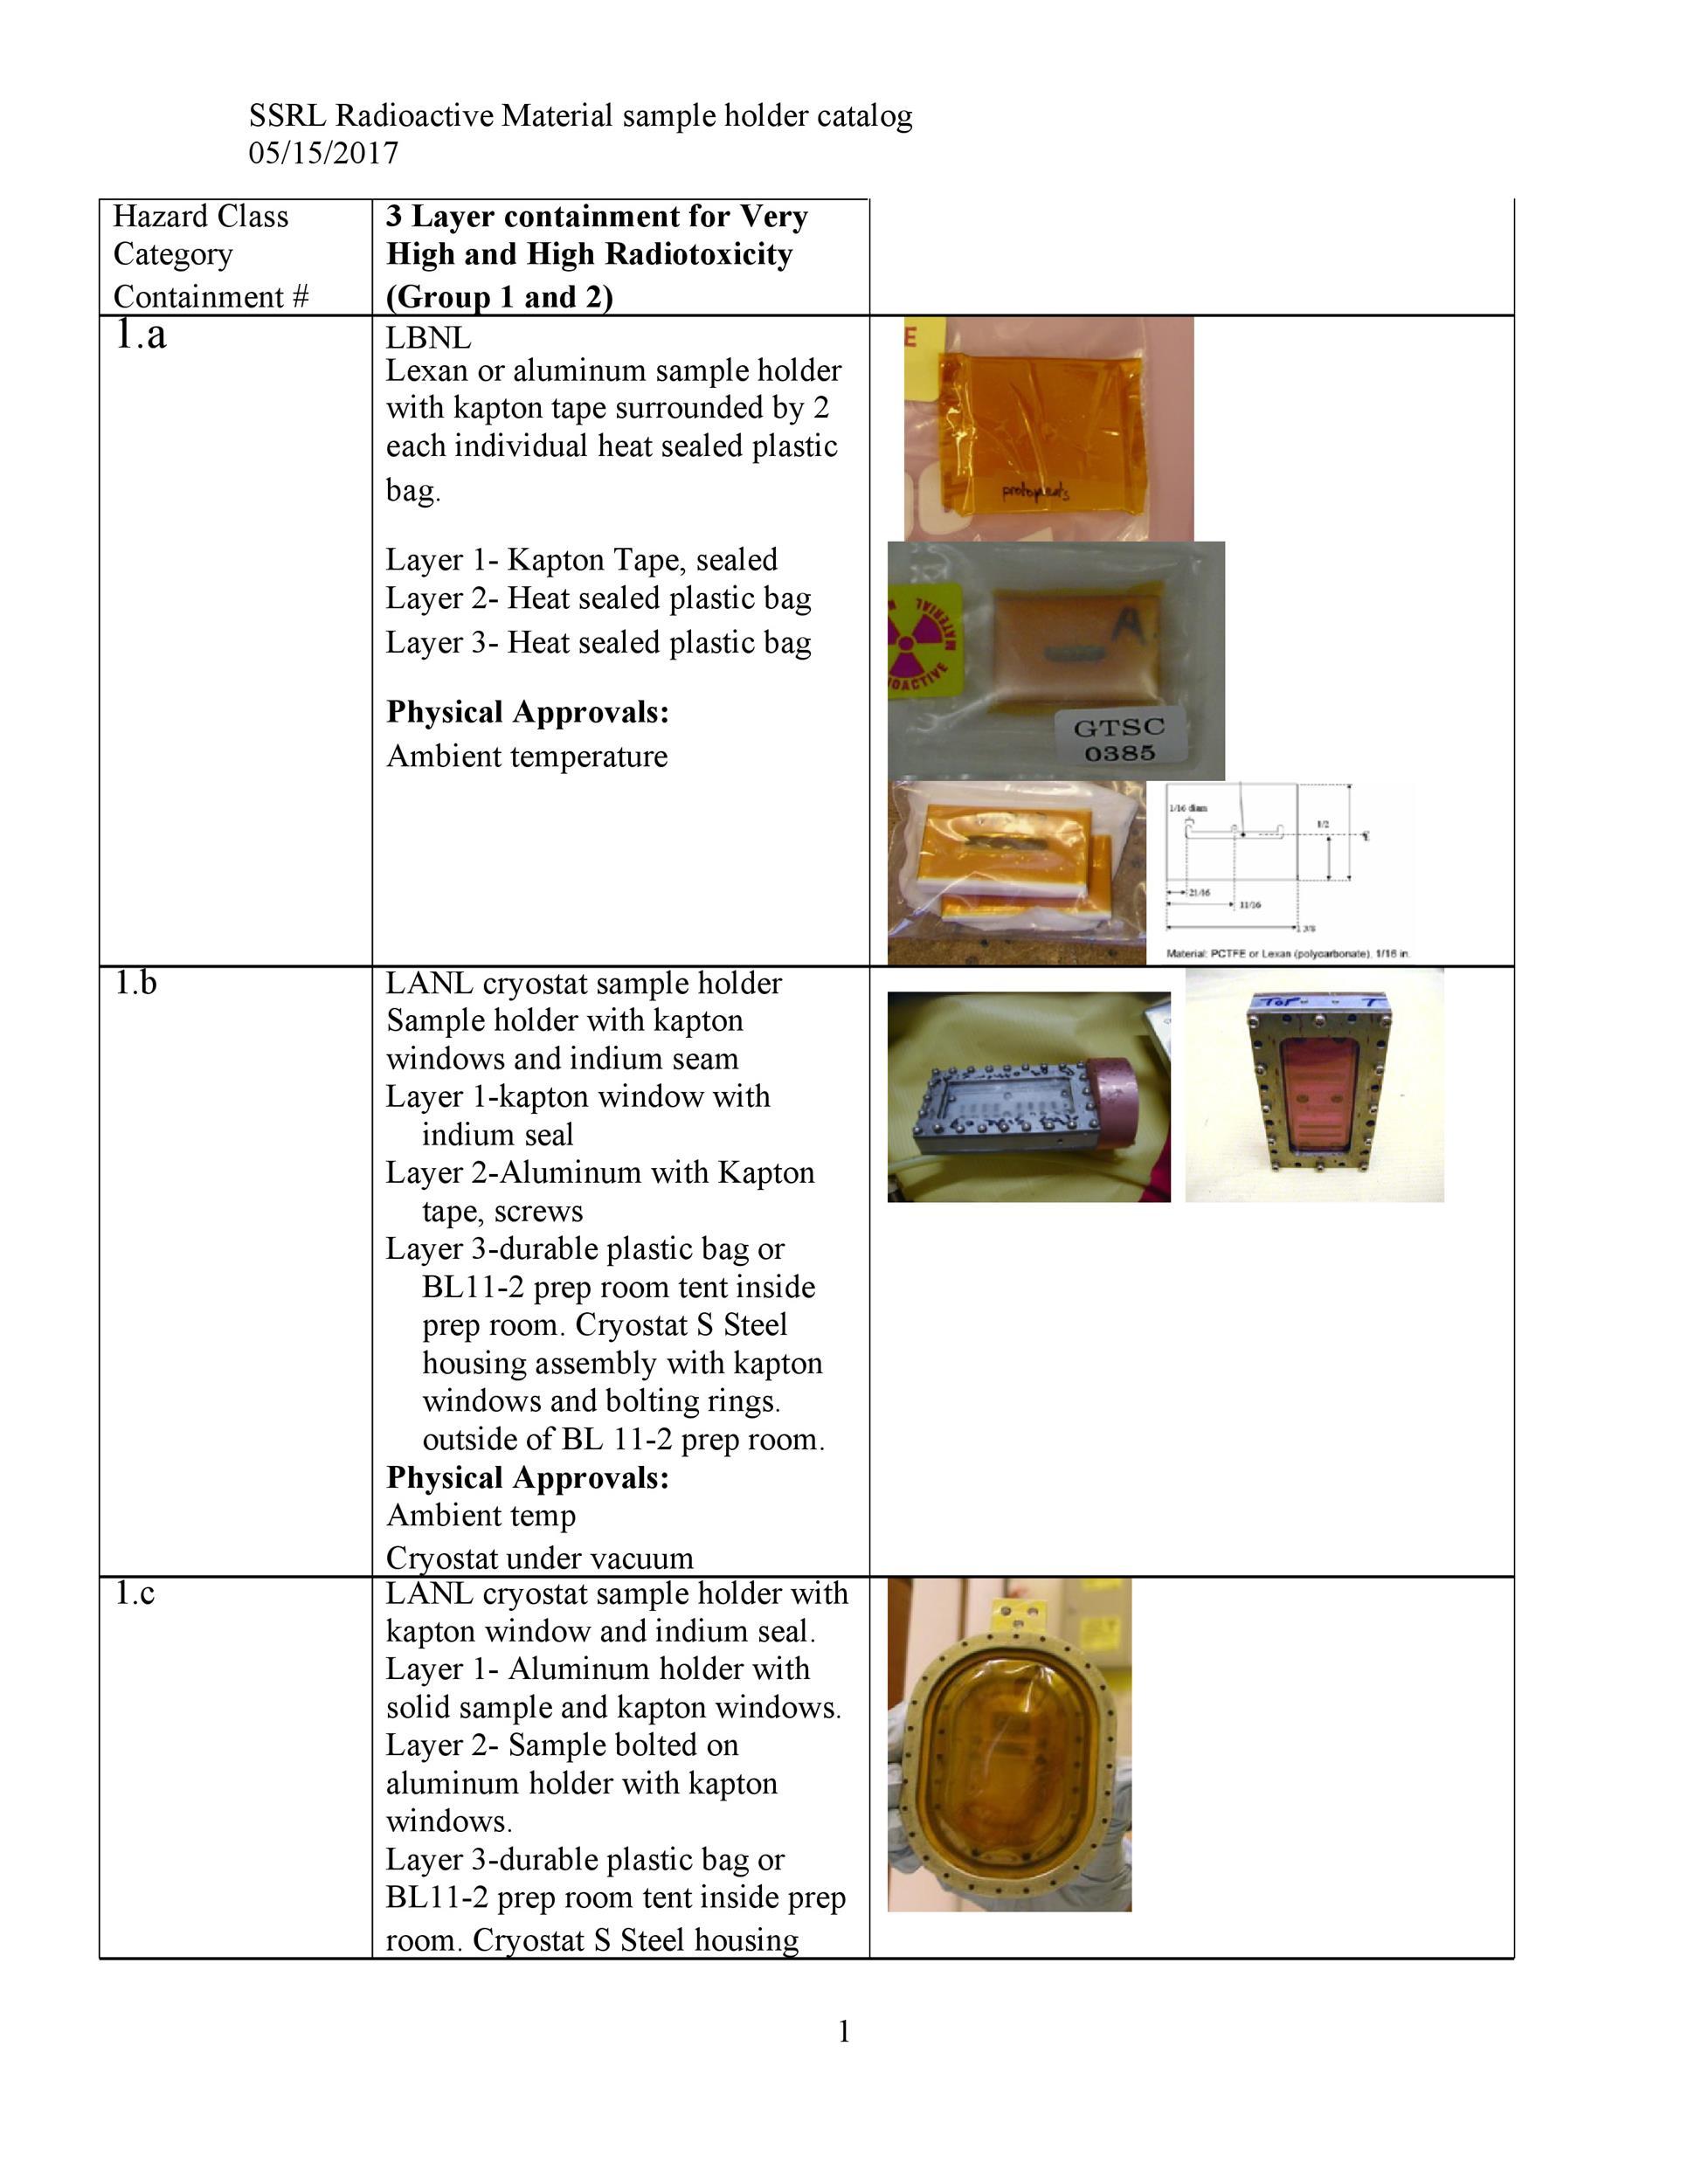 Free catalog template 32